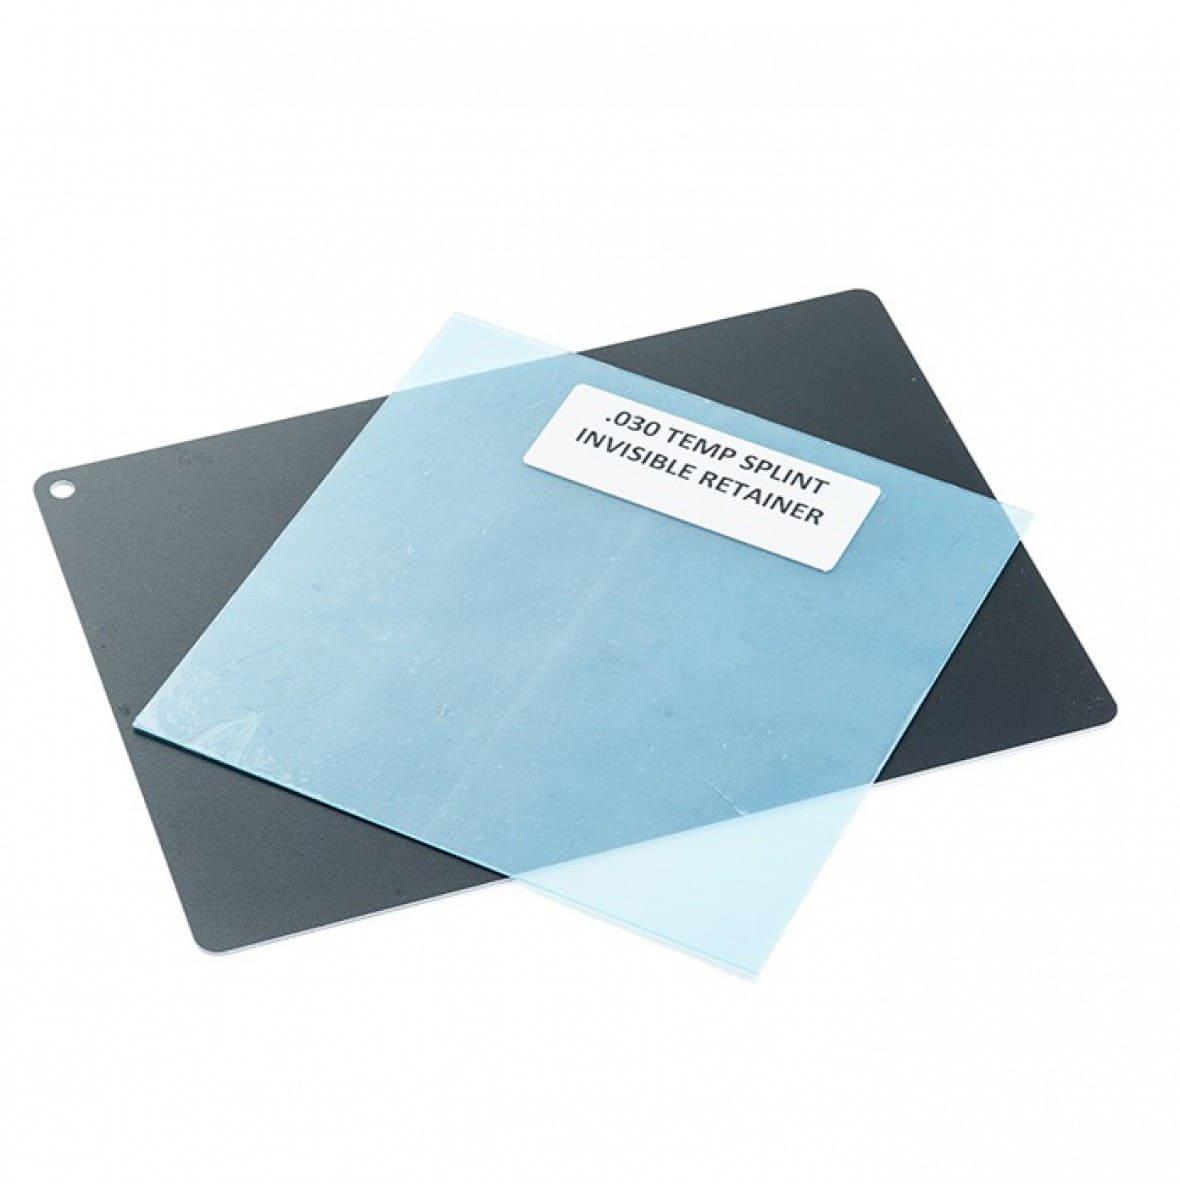 Пластины 030 Pro-Form Retainer д/ретейнеров 0,8 мм